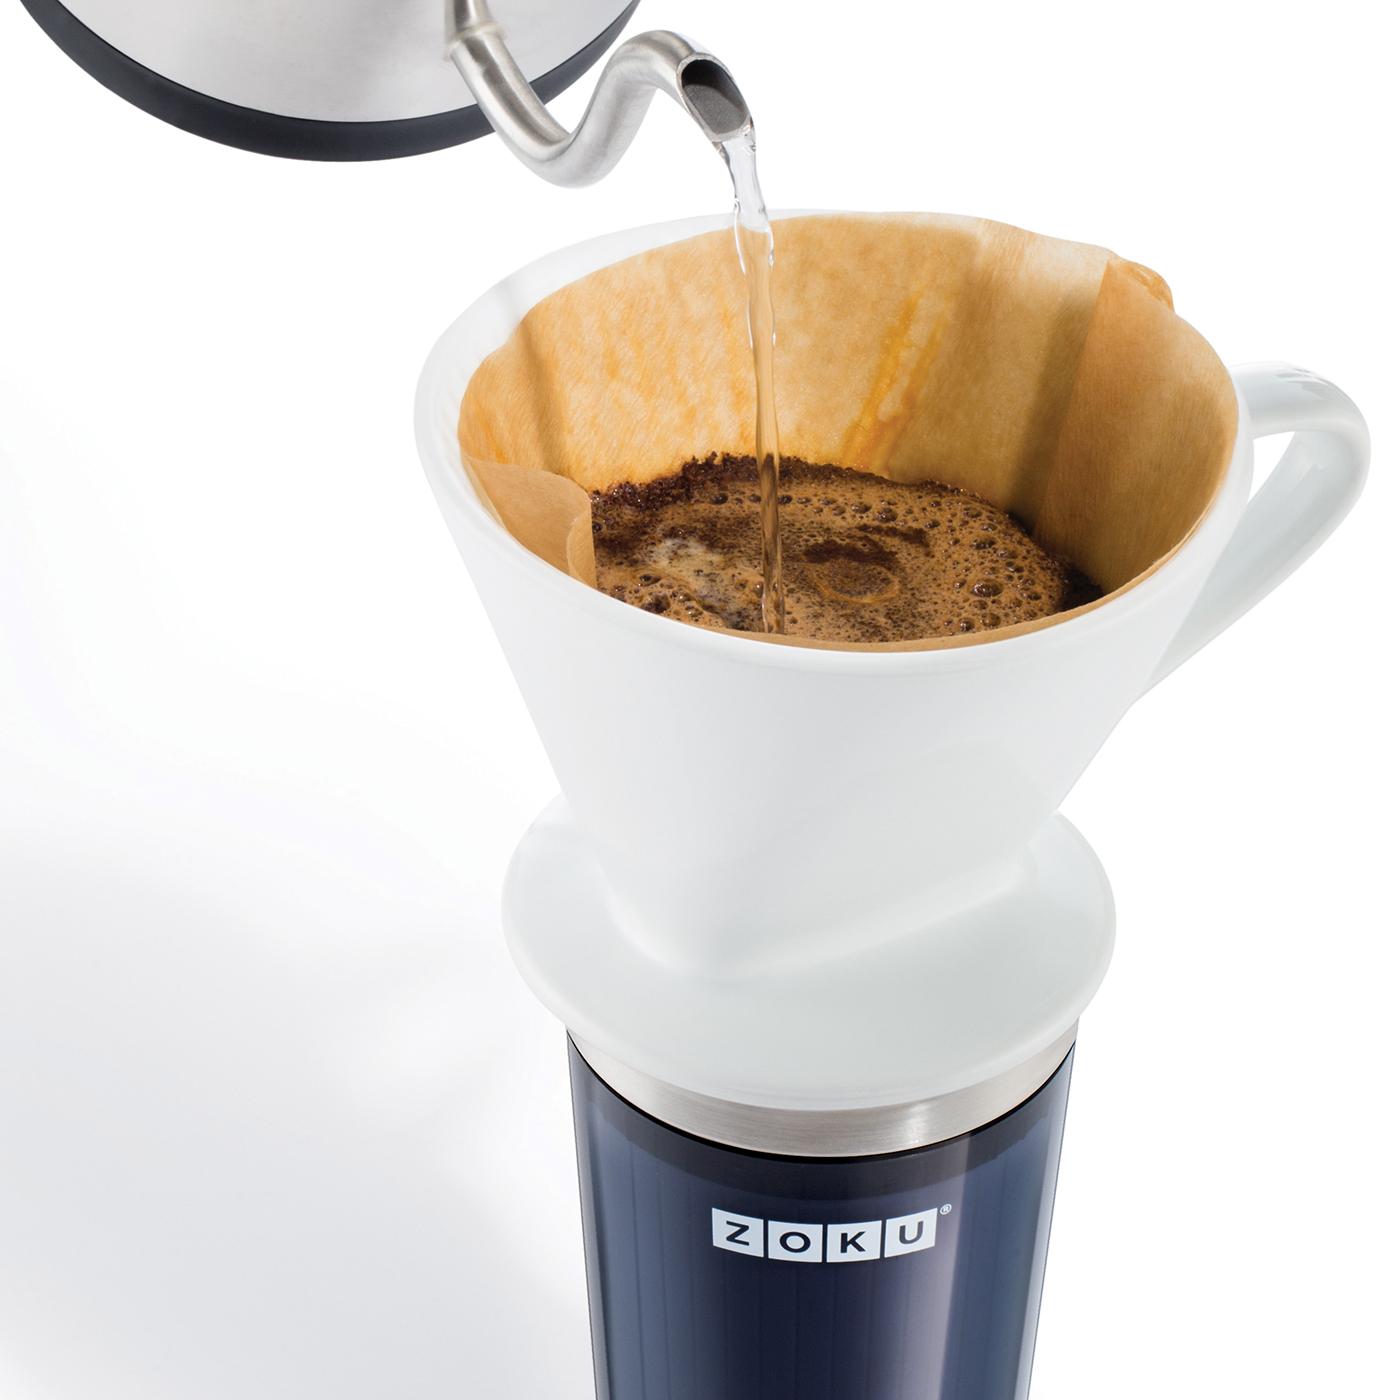 Zoku冰镇咖啡壶设计